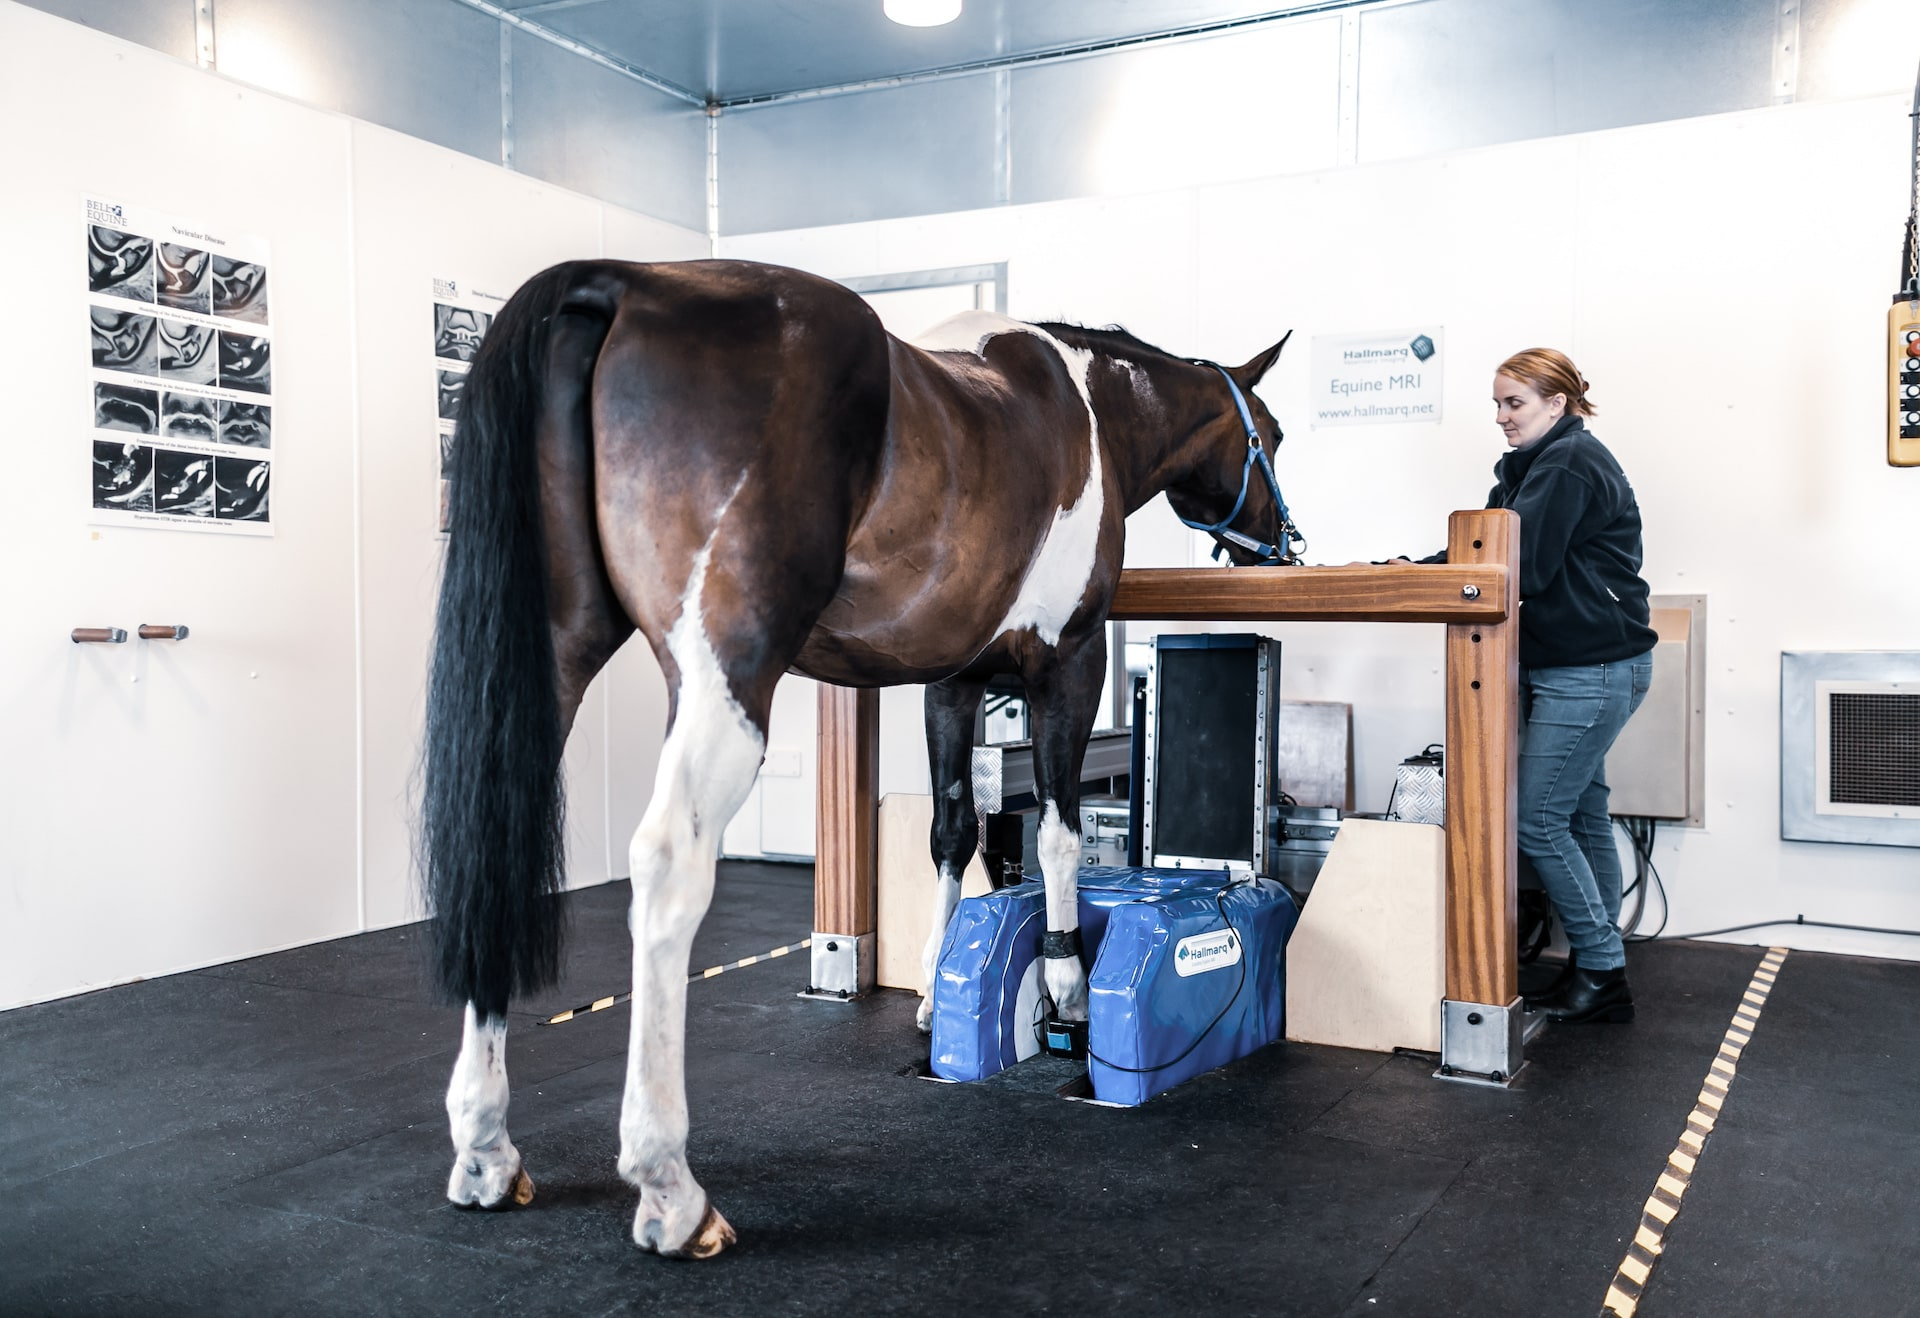 Equine MRI, standing MRI for Horses